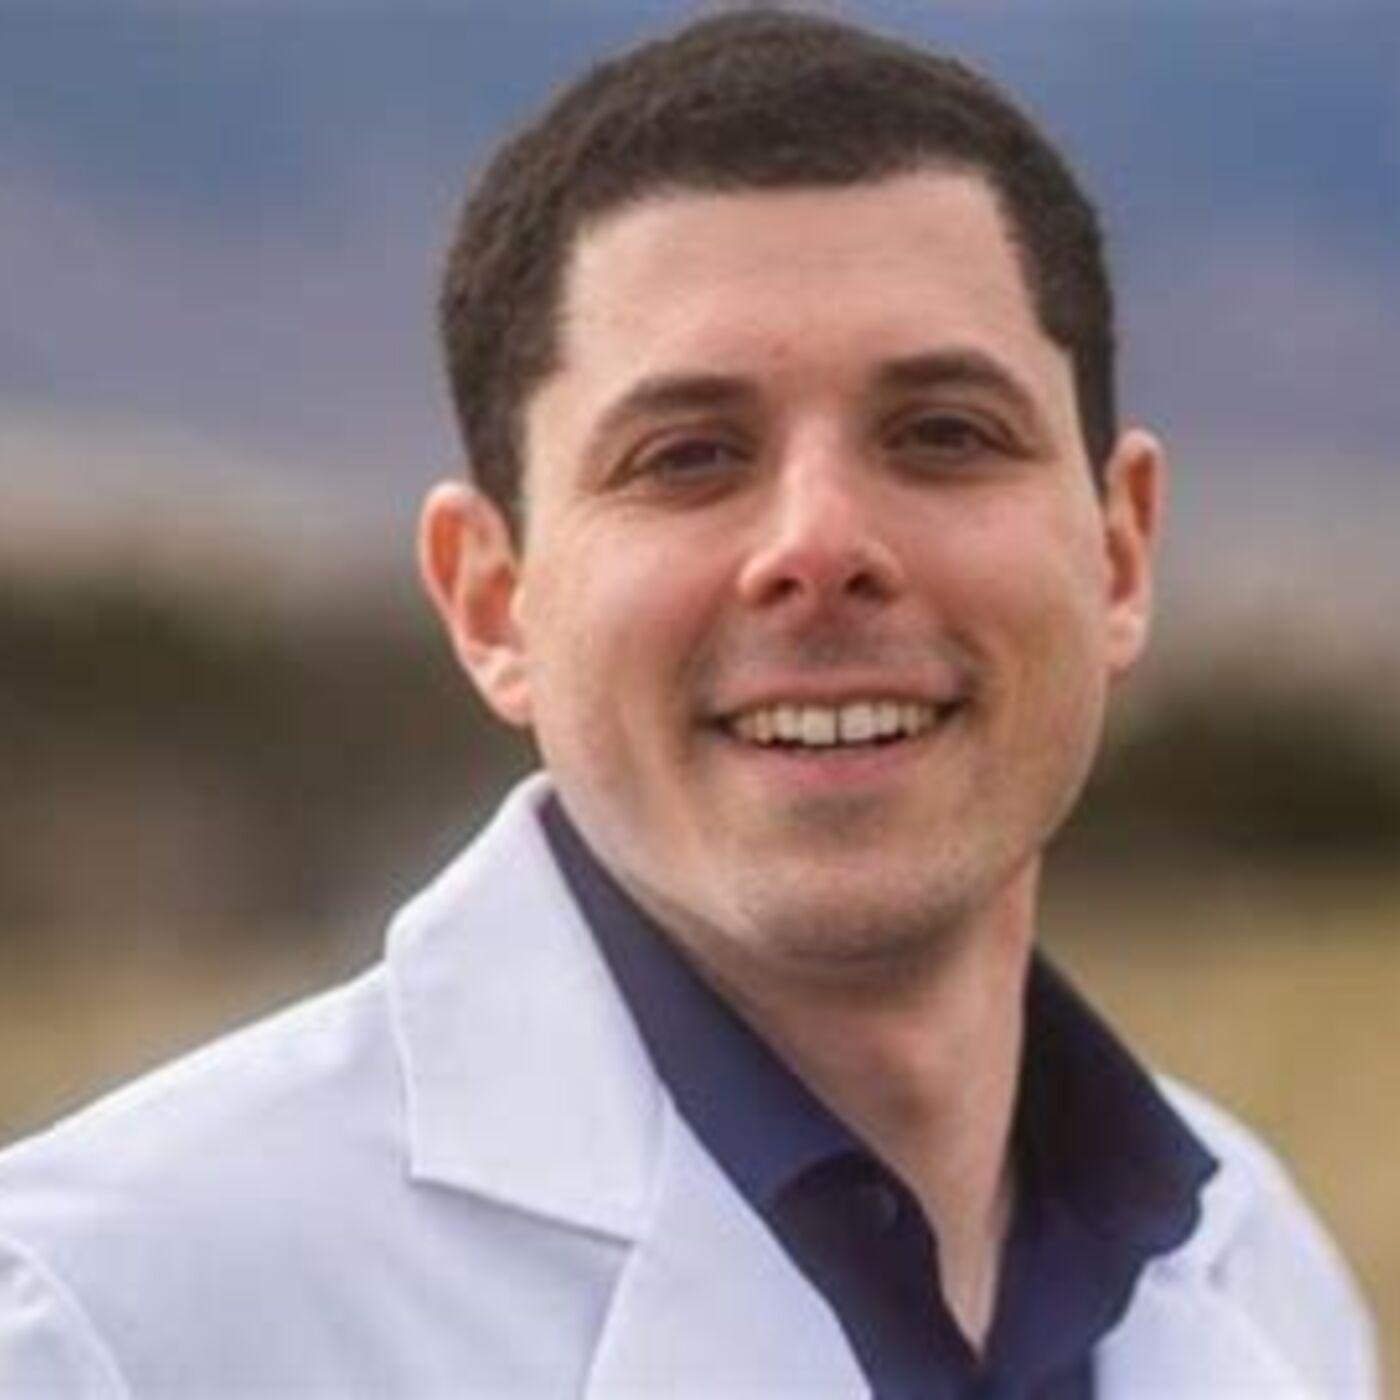 Medical Device Rep Podcast: Dr. Daniel Paull